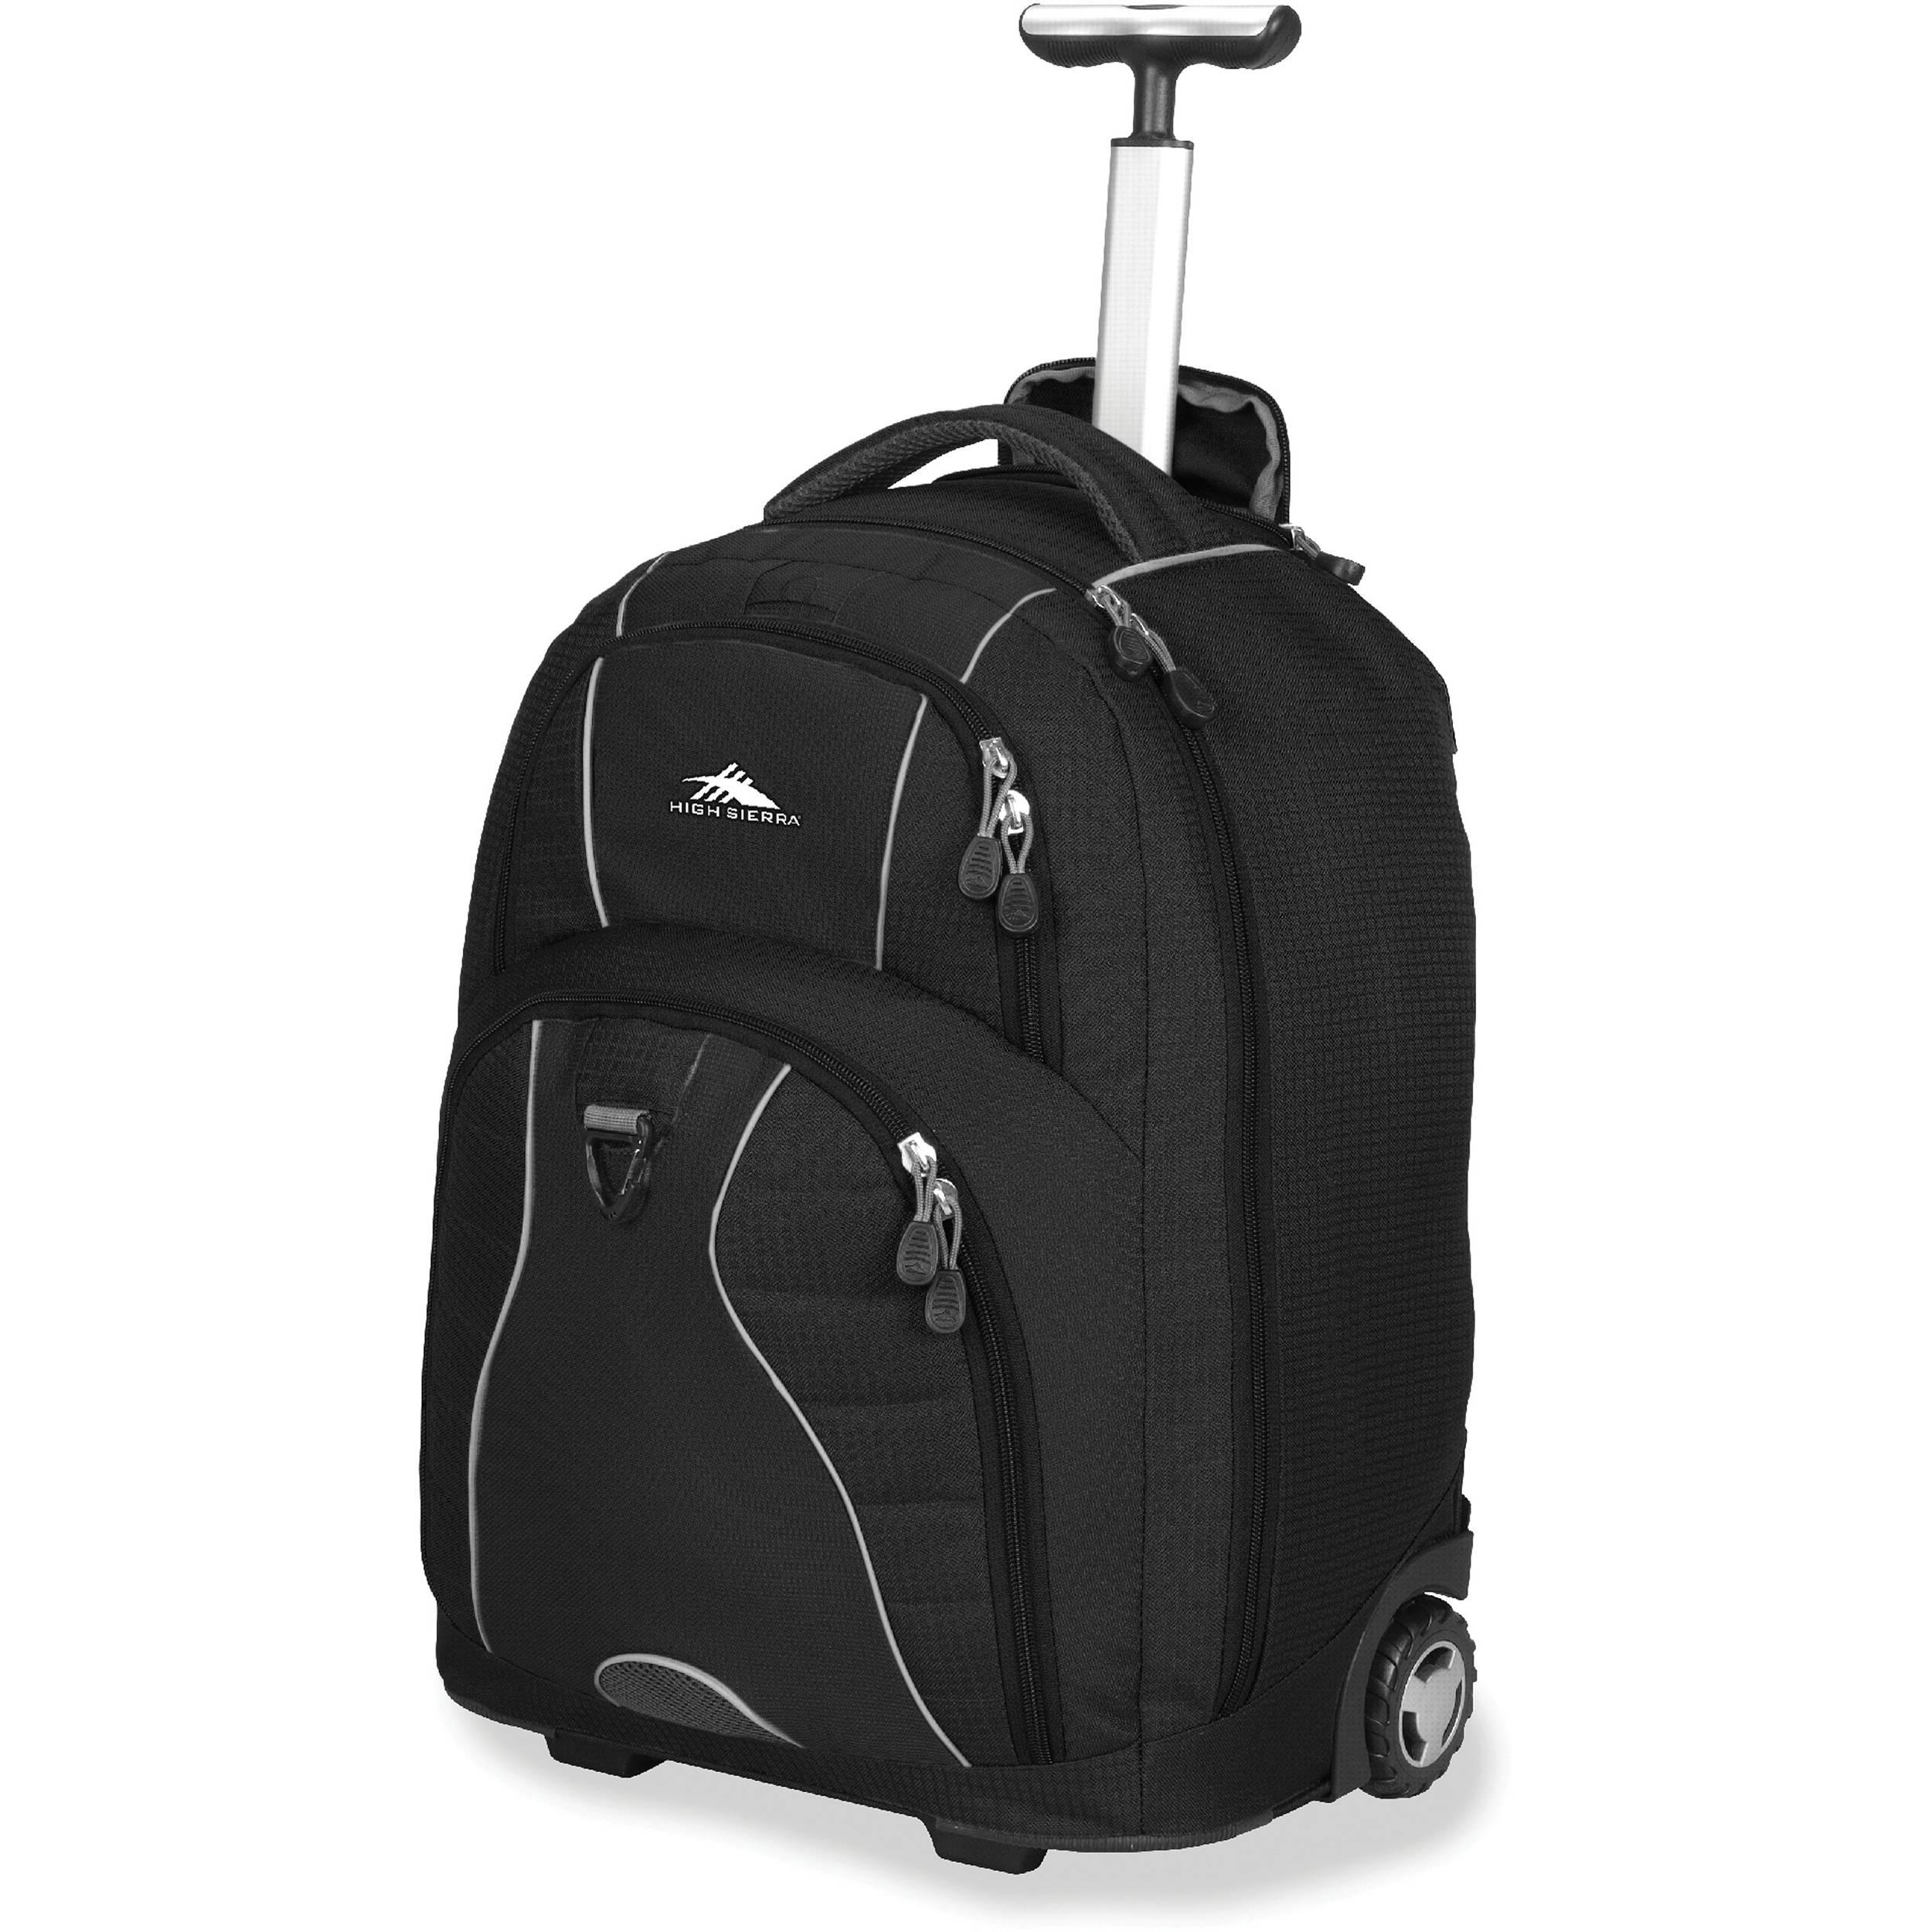 Sierra Freewheel Wheeled Backpack (Black / Black)